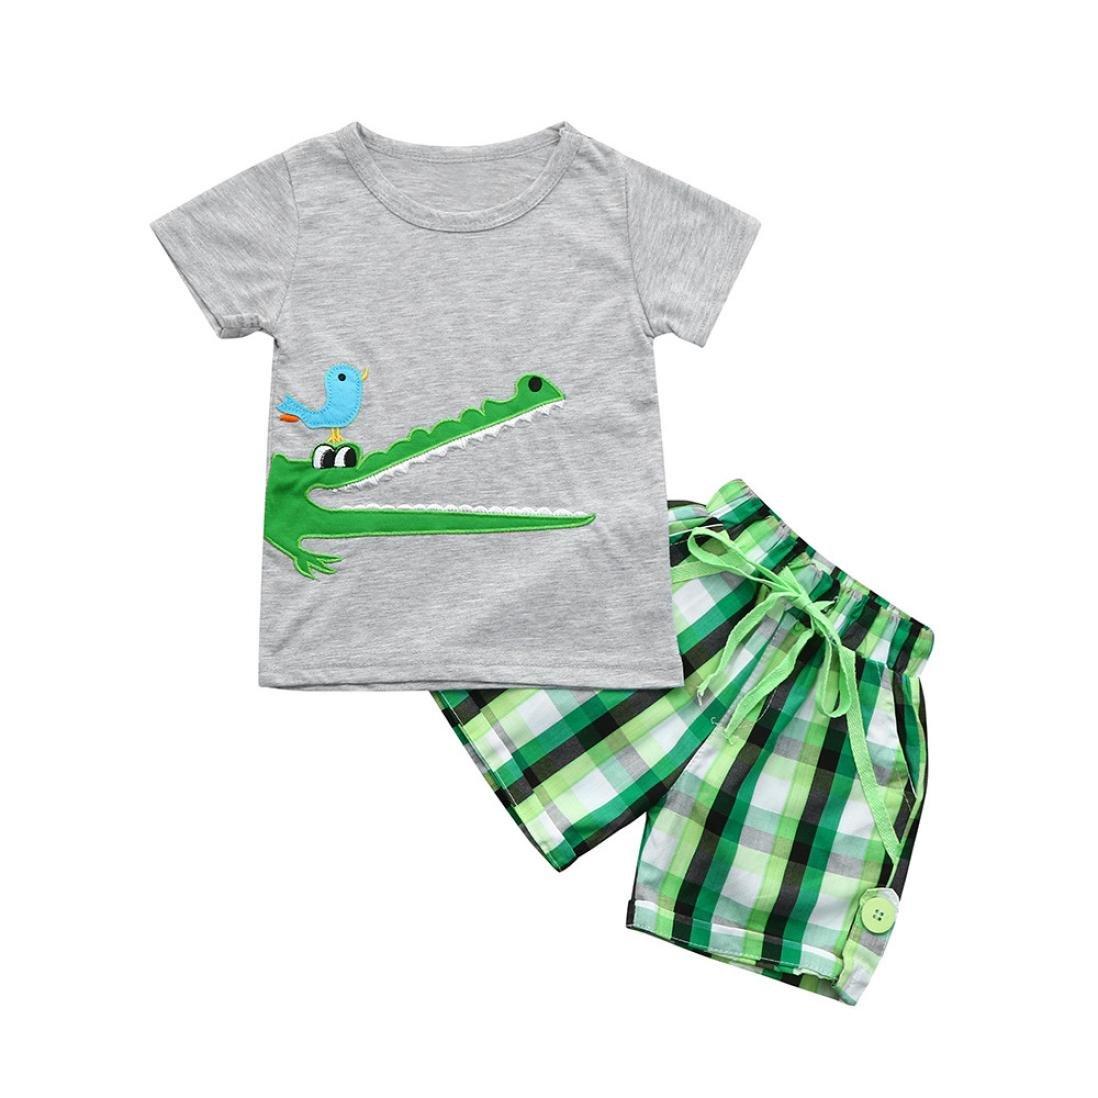 Jimmackey 2Pcs Bambino Ragazzo T-Shirt Fumetto Ricamo Applique Camicia Cime + Plaid Pantaloncini Abiti Set